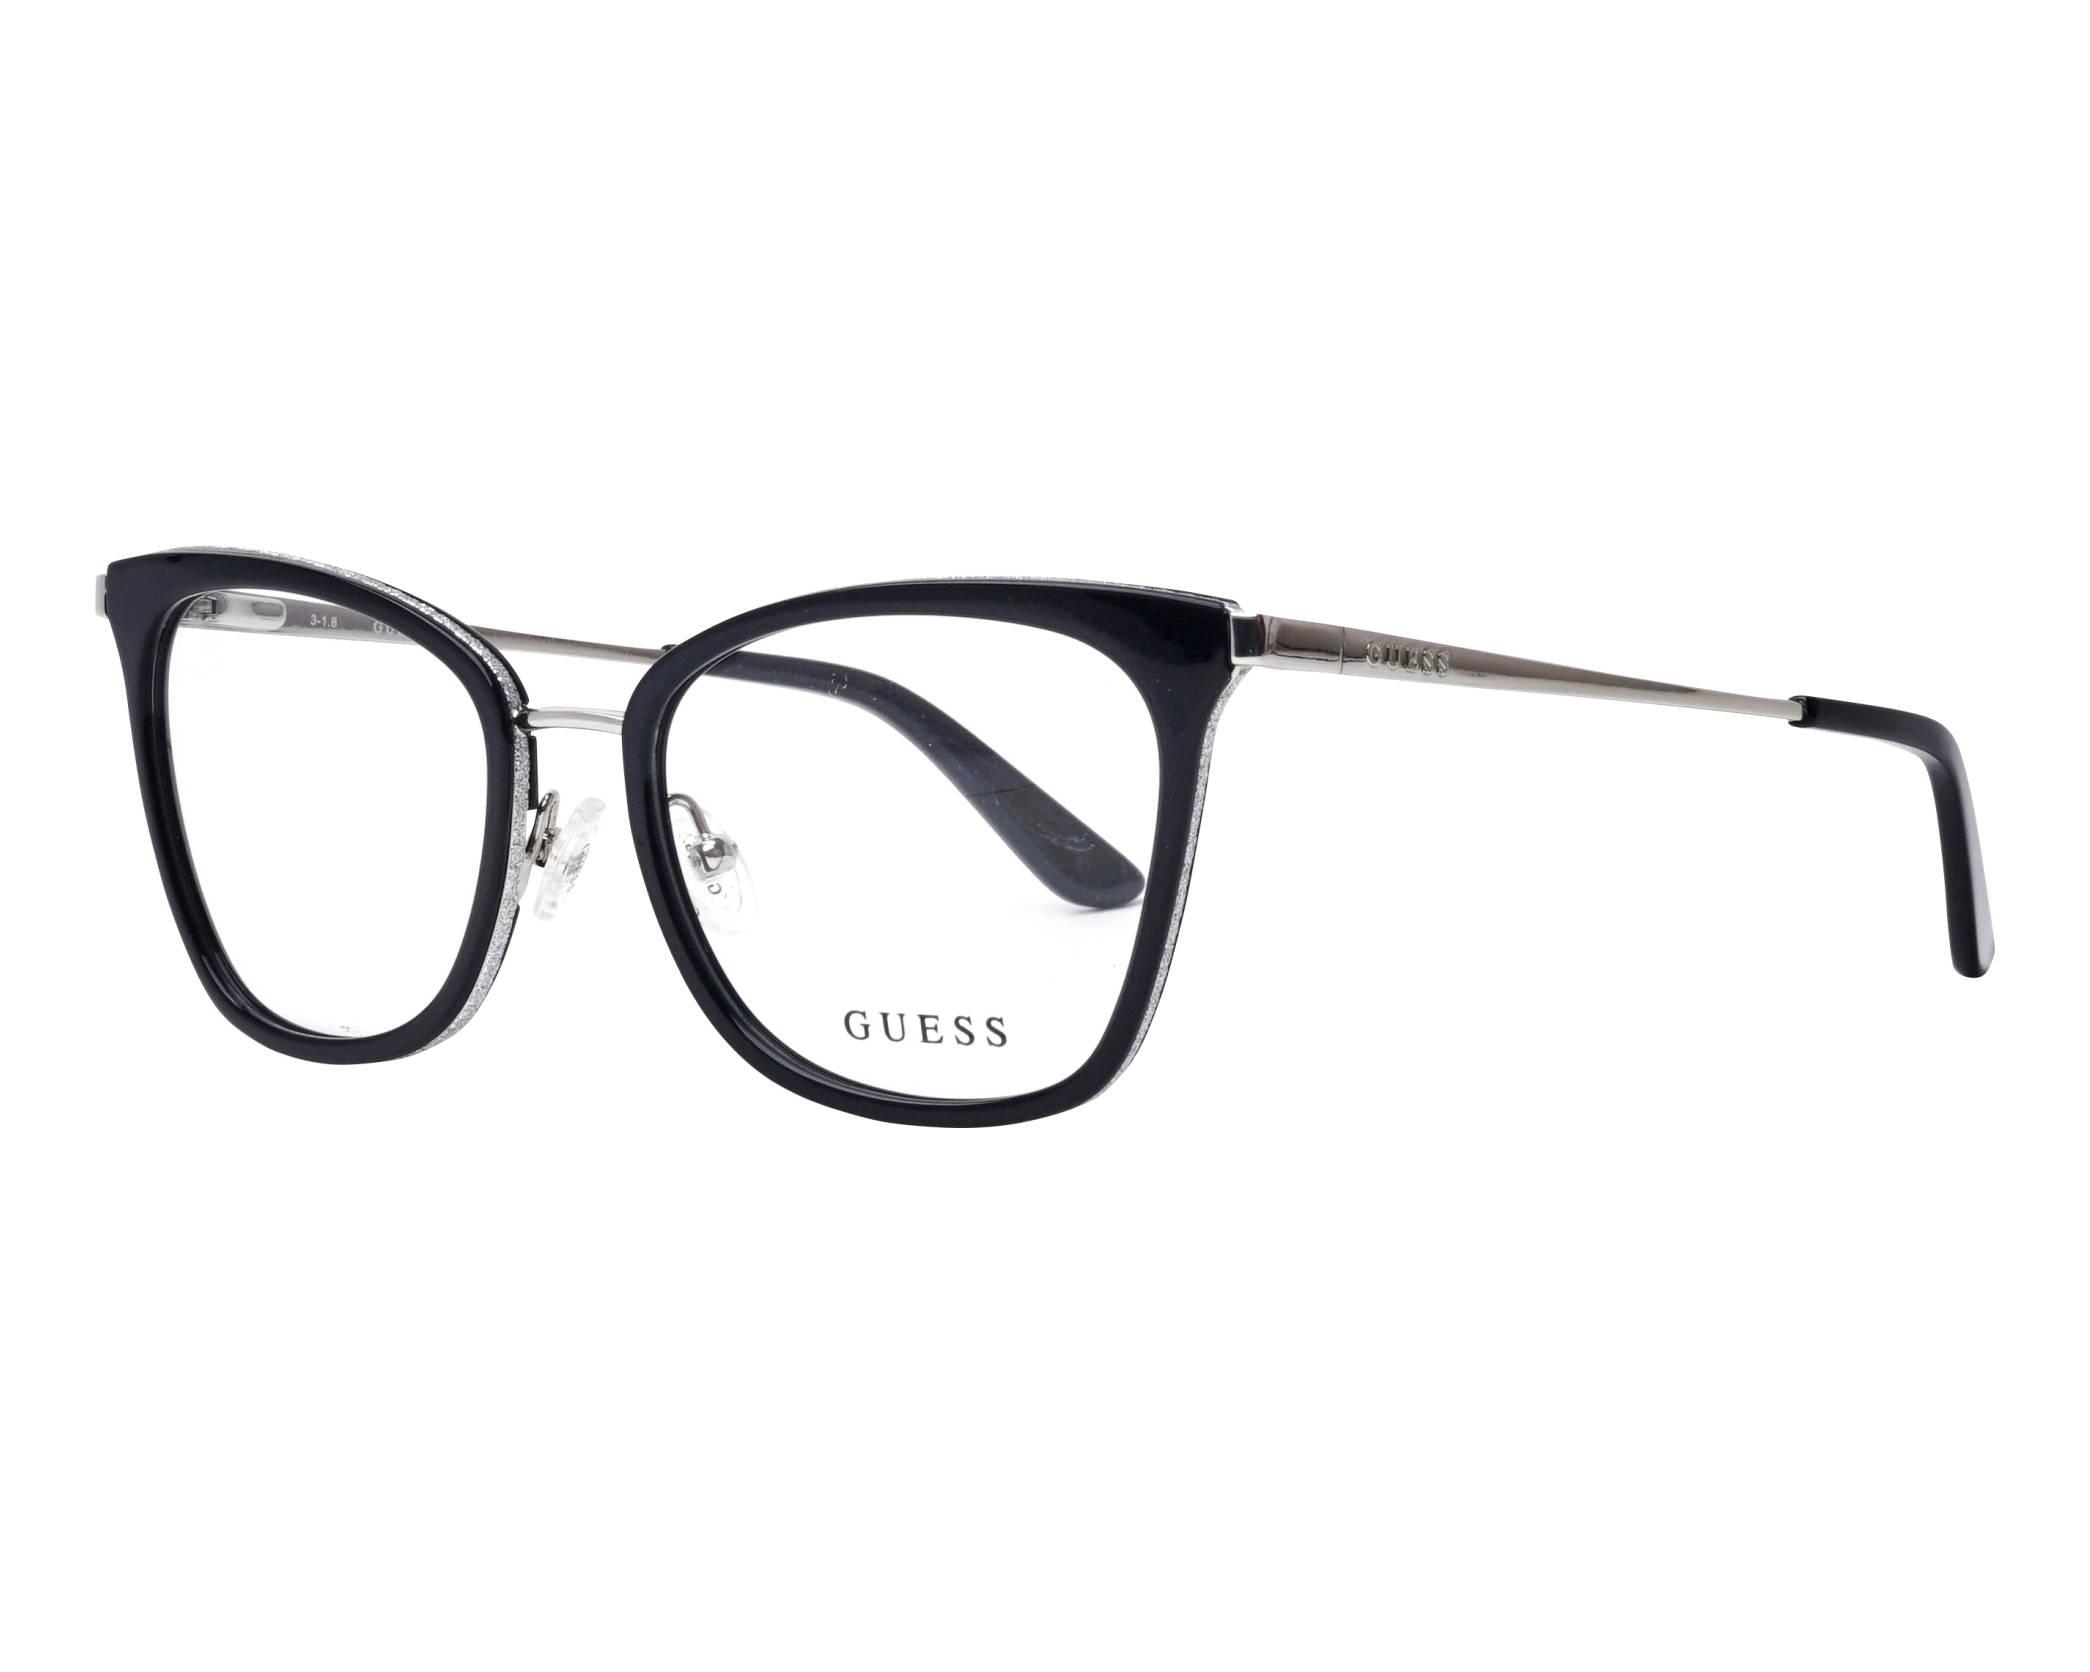 20d7d40f8554d eyeglasses Guess GU-2706-V 001 52-17 Black Silver profile view